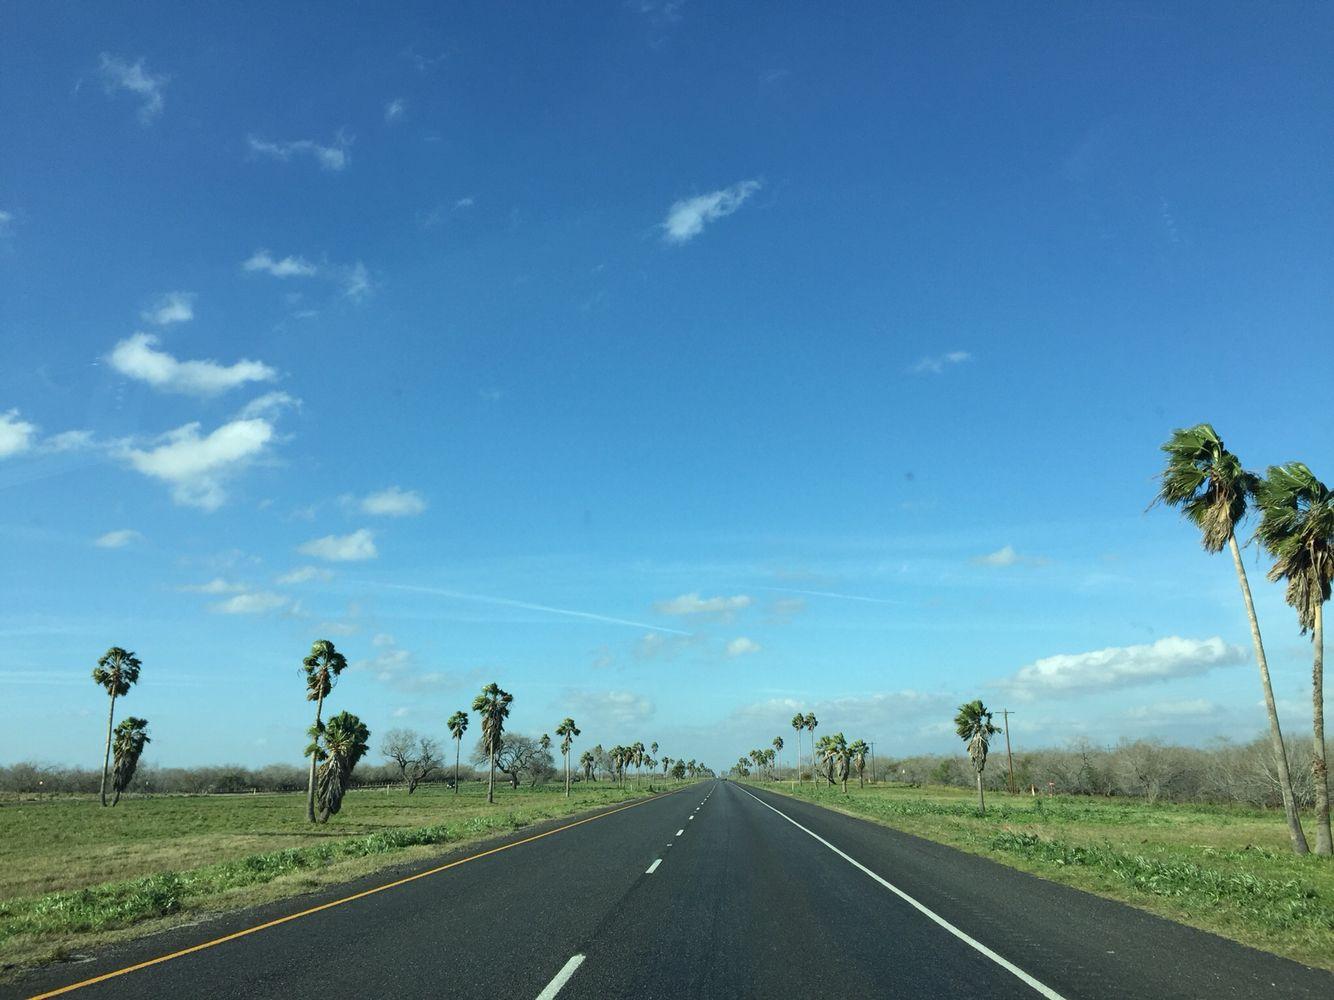 Highway 77, South Texas Texas adventure, Texas places